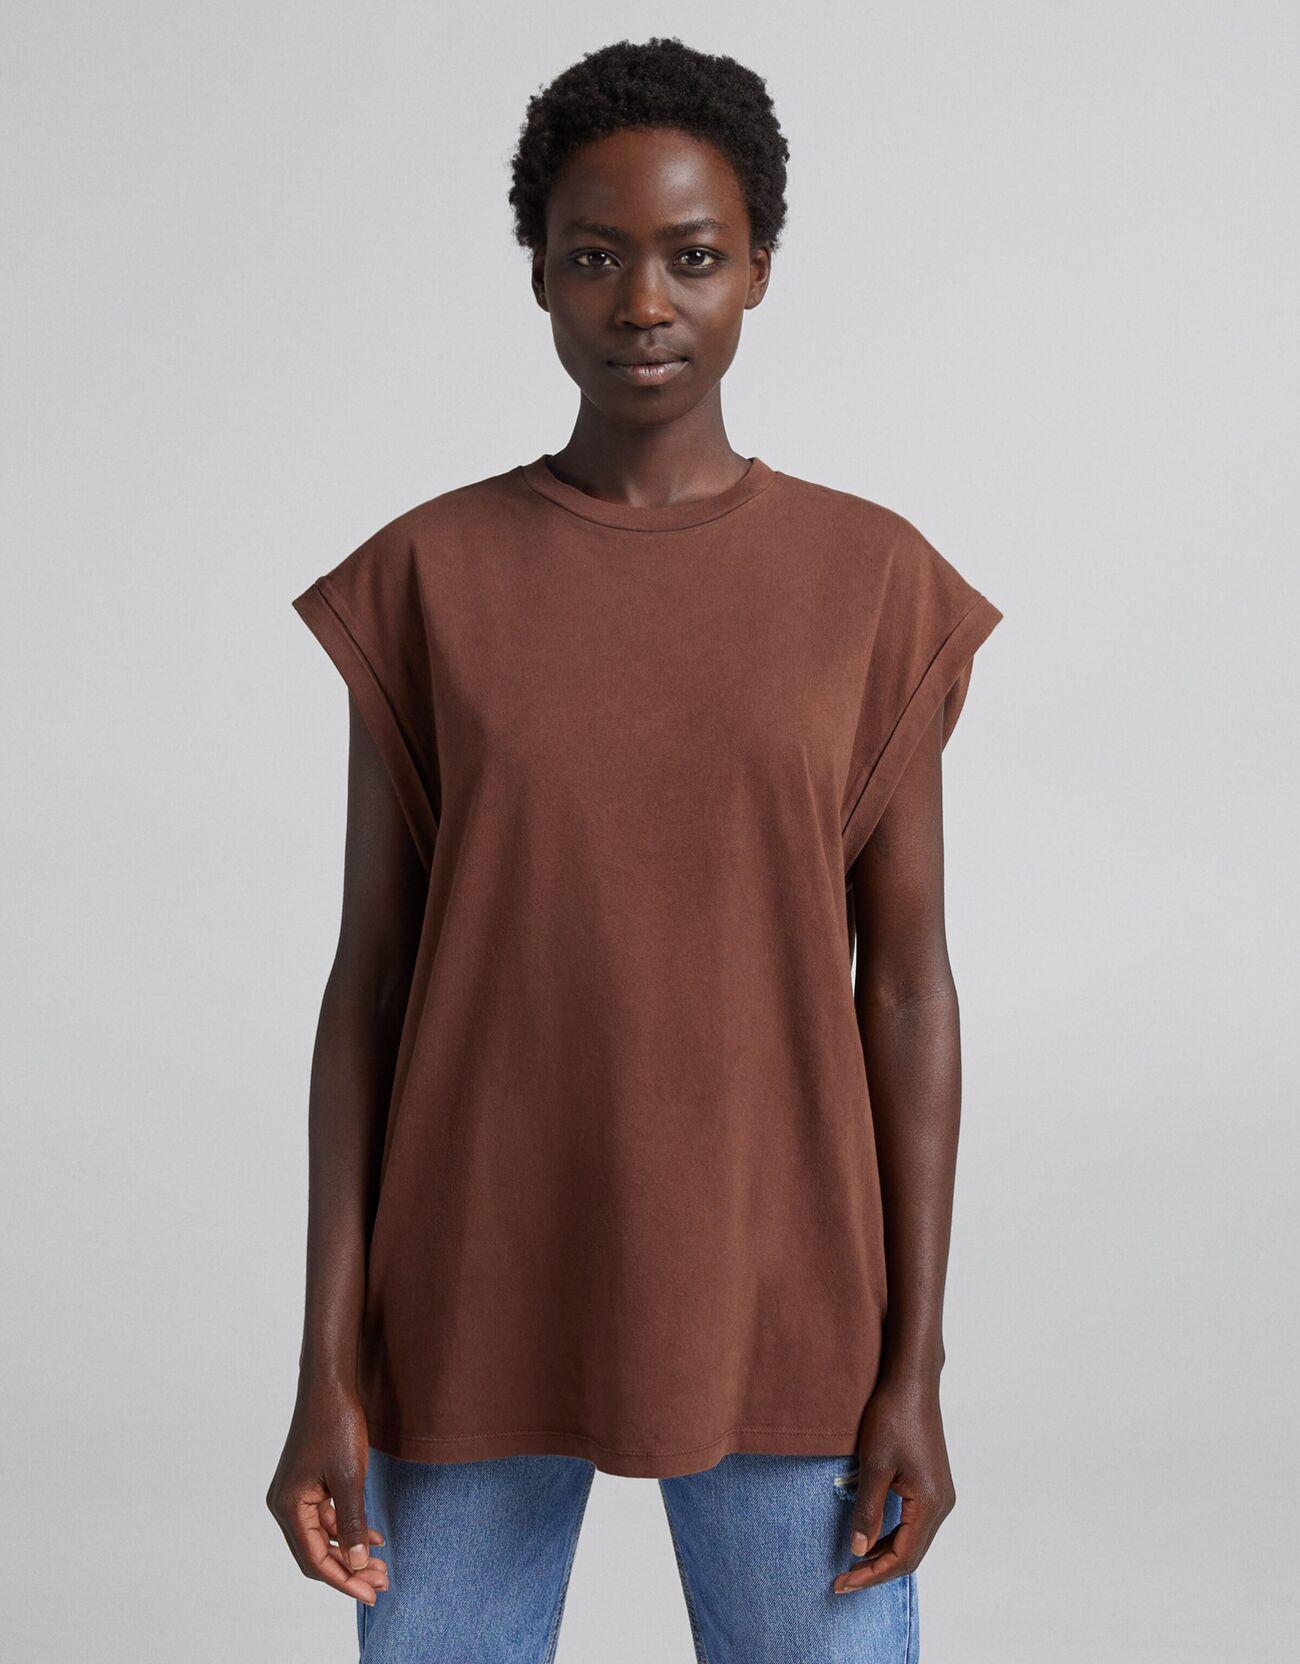 Bershka Camiseta Oversize Efecto Lavado Mujer L Marrón